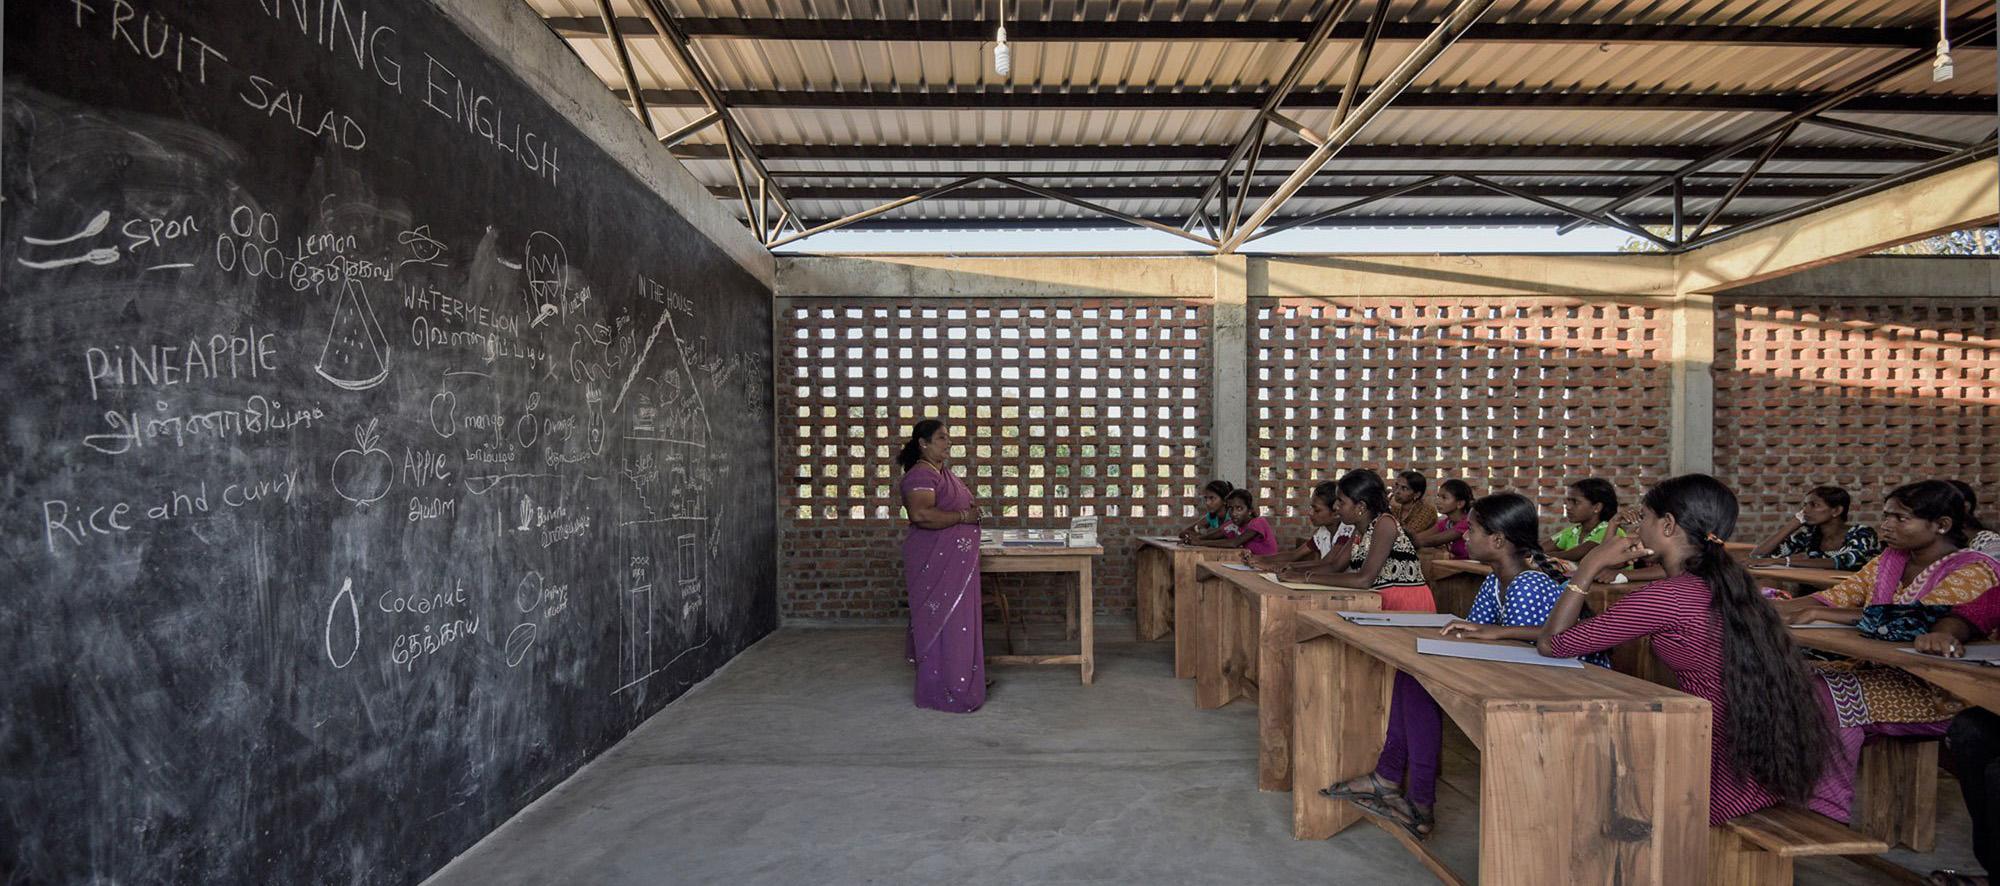 Centro de aprendizaje Lanka por feat.collective. Fotografía © feat.collective